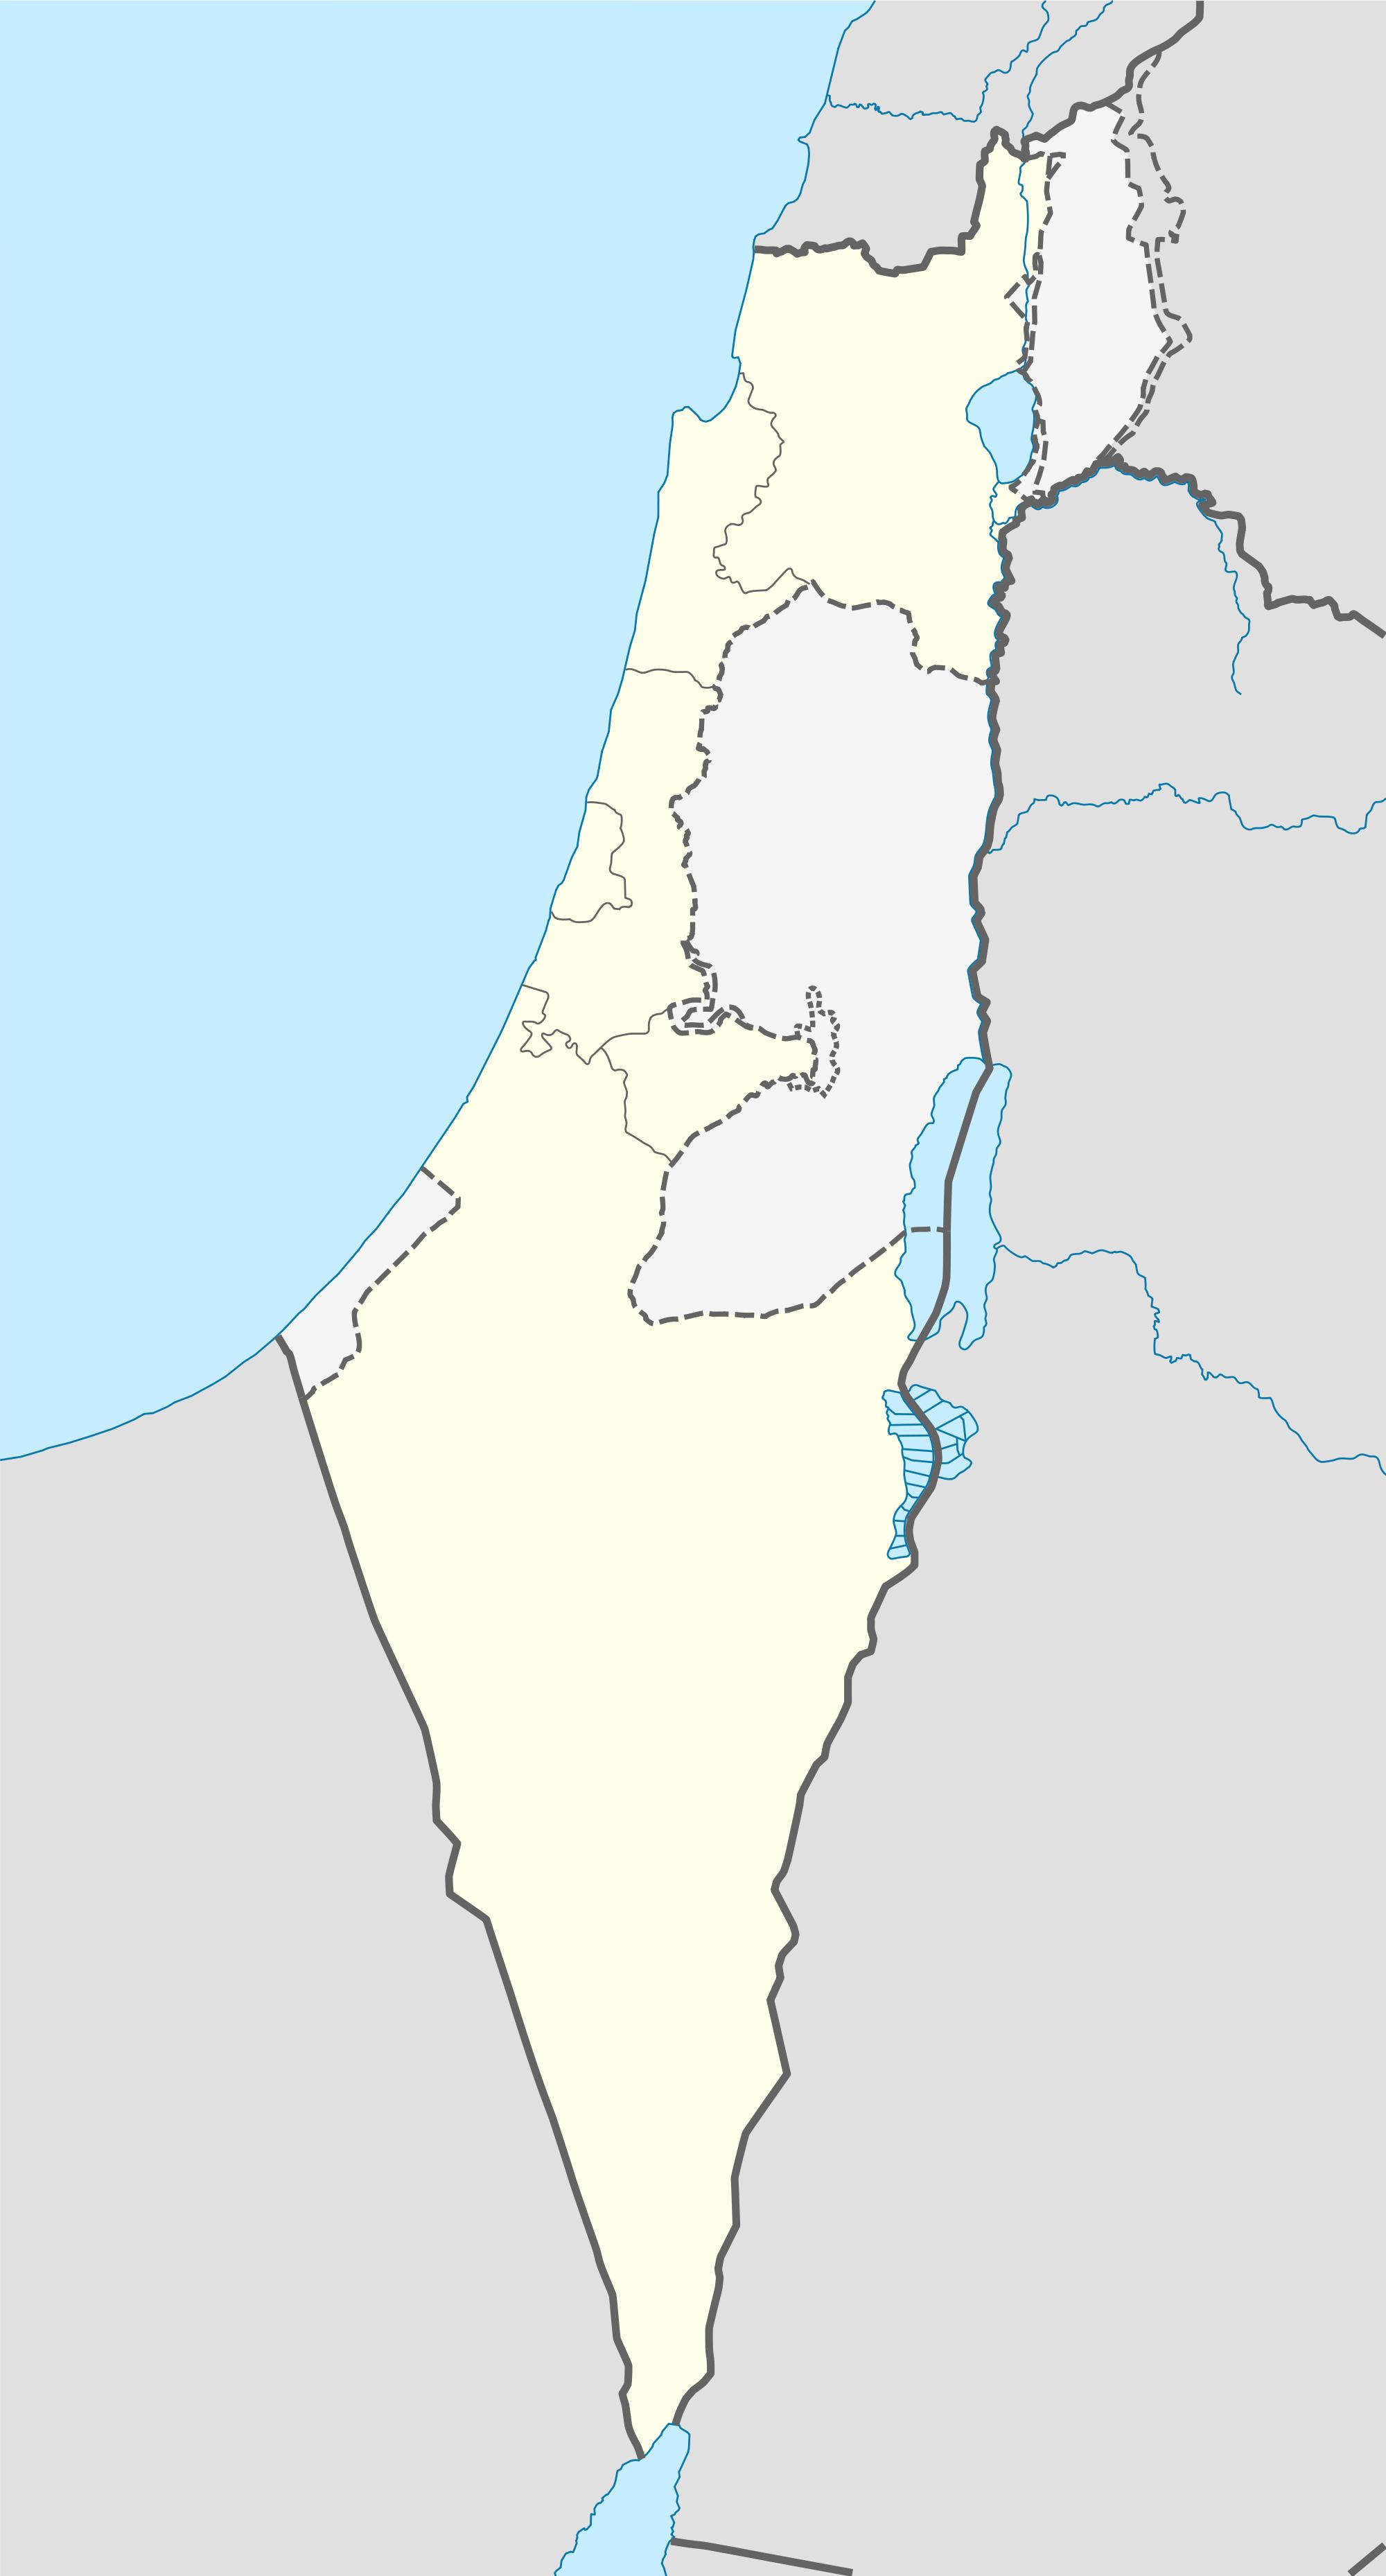 image israel outline map gta wiki fandom powered by wikia